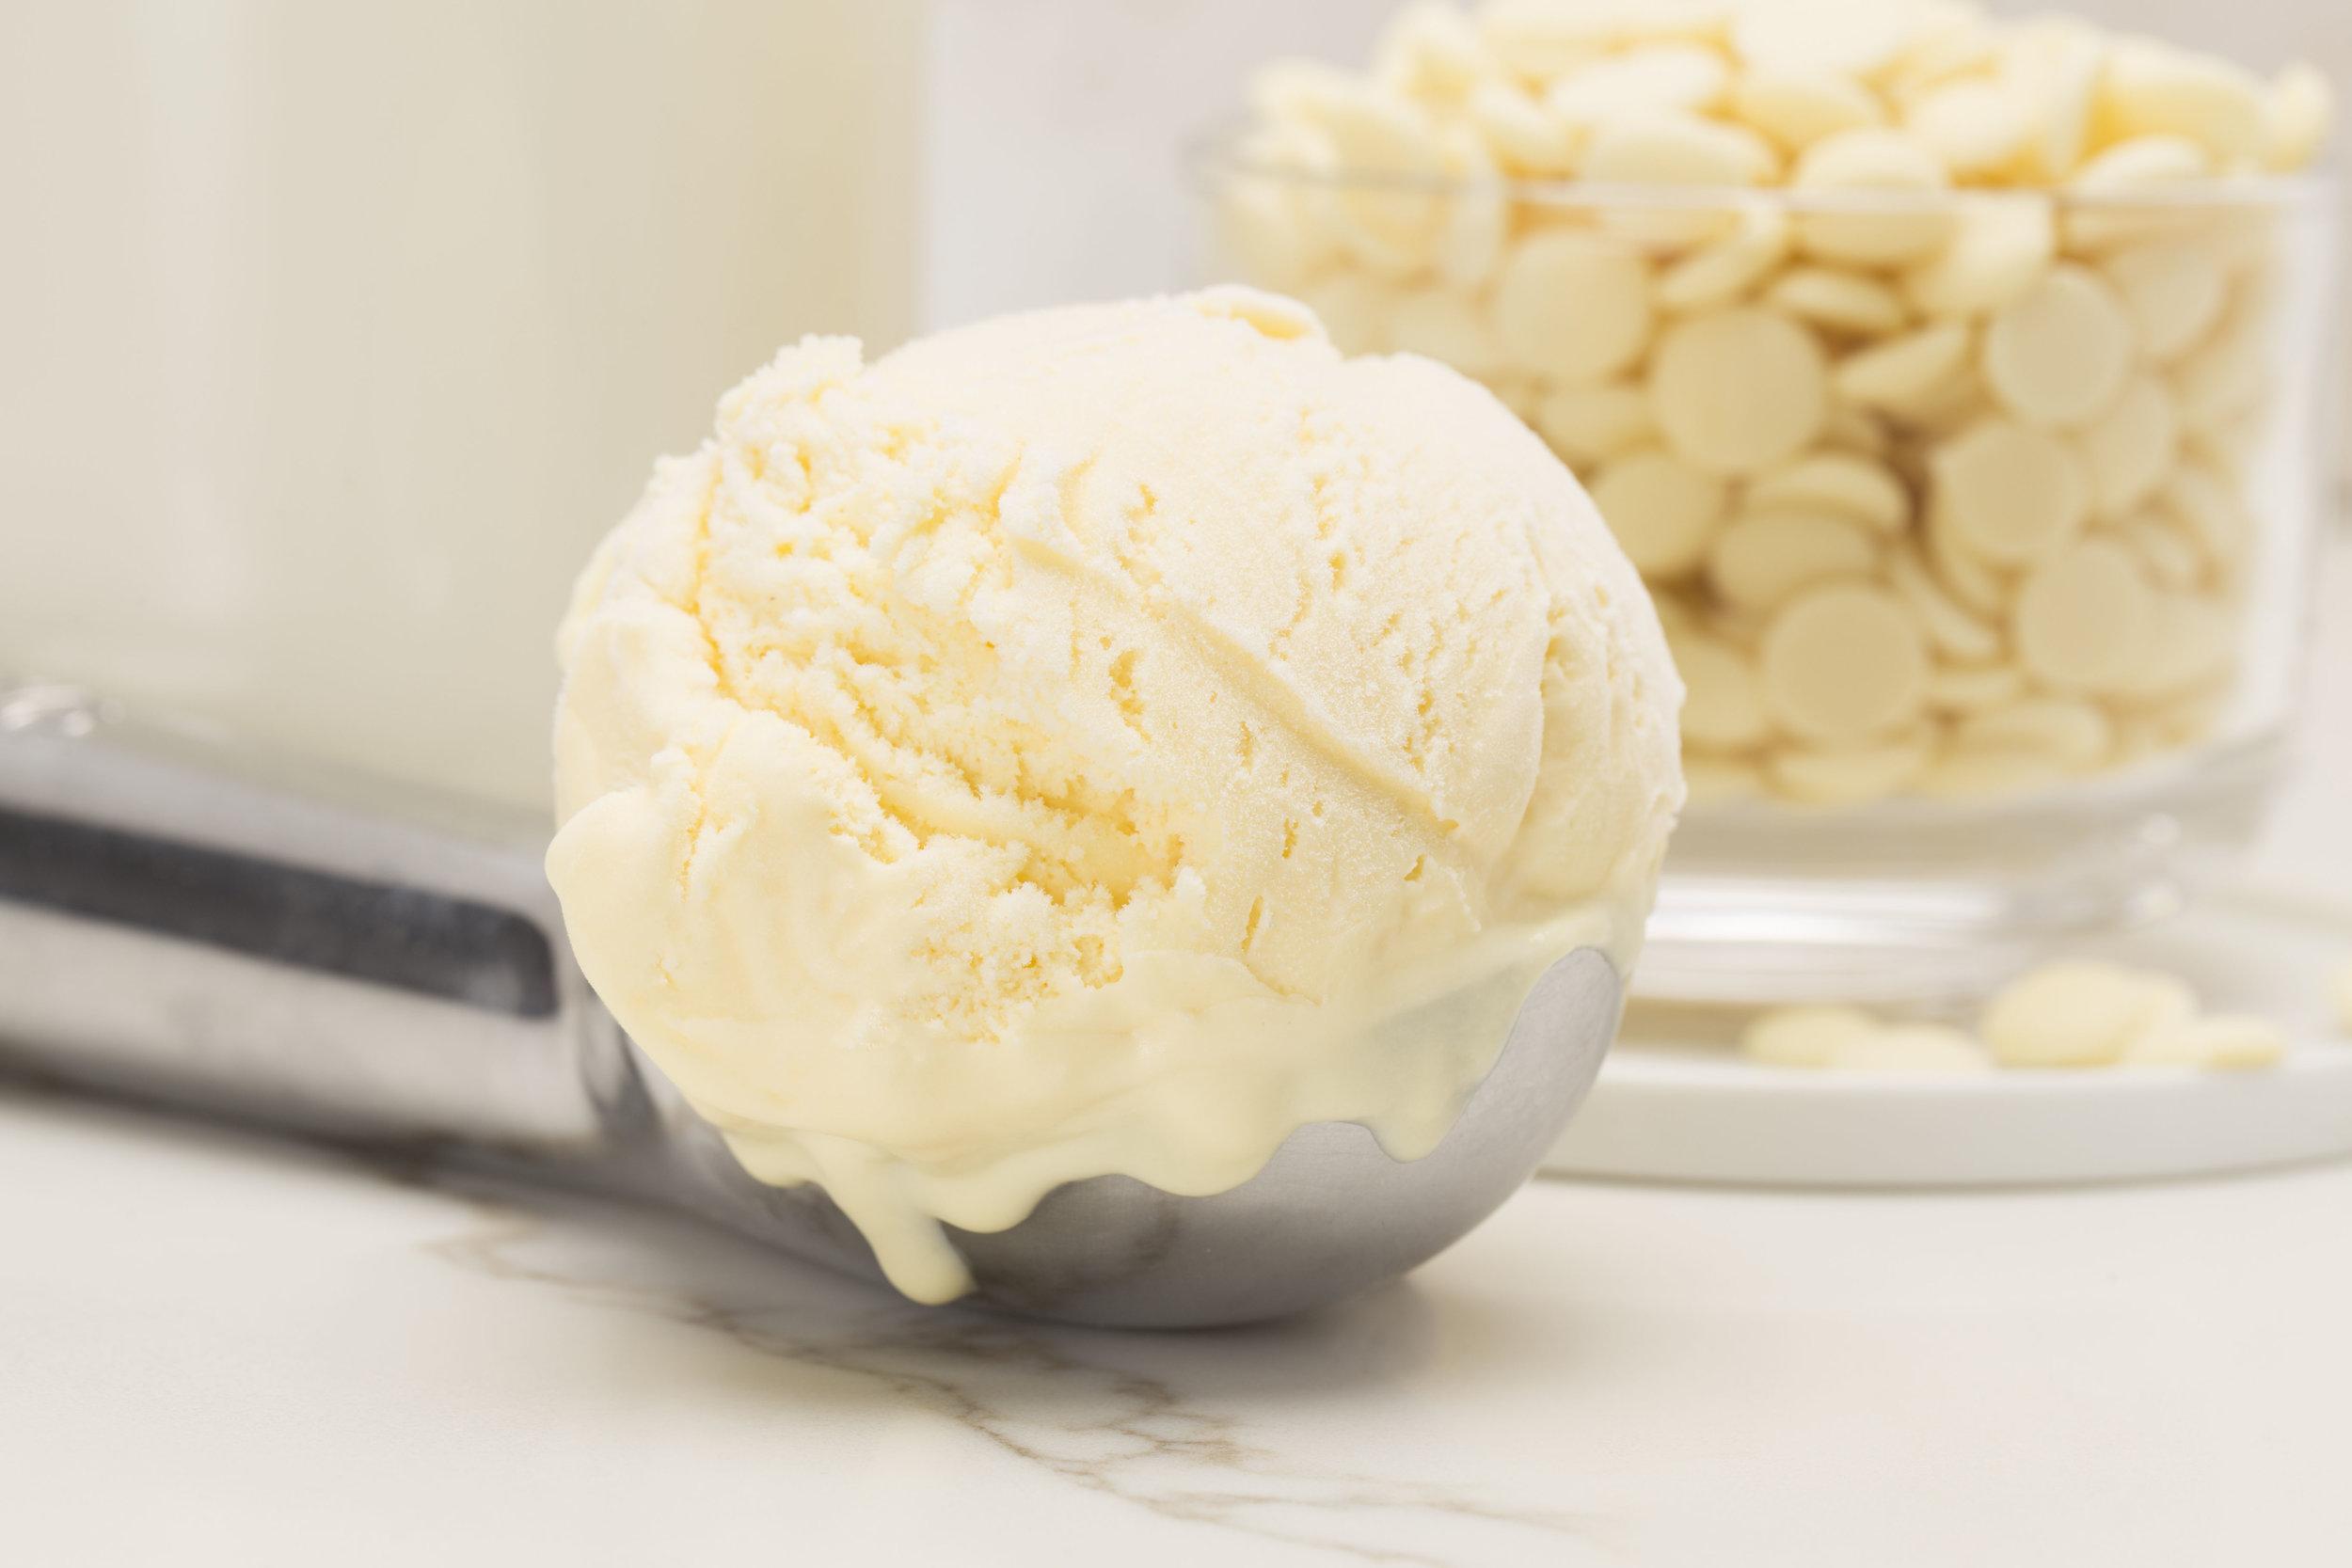 caffe demetre's white chocolate silk ice cream